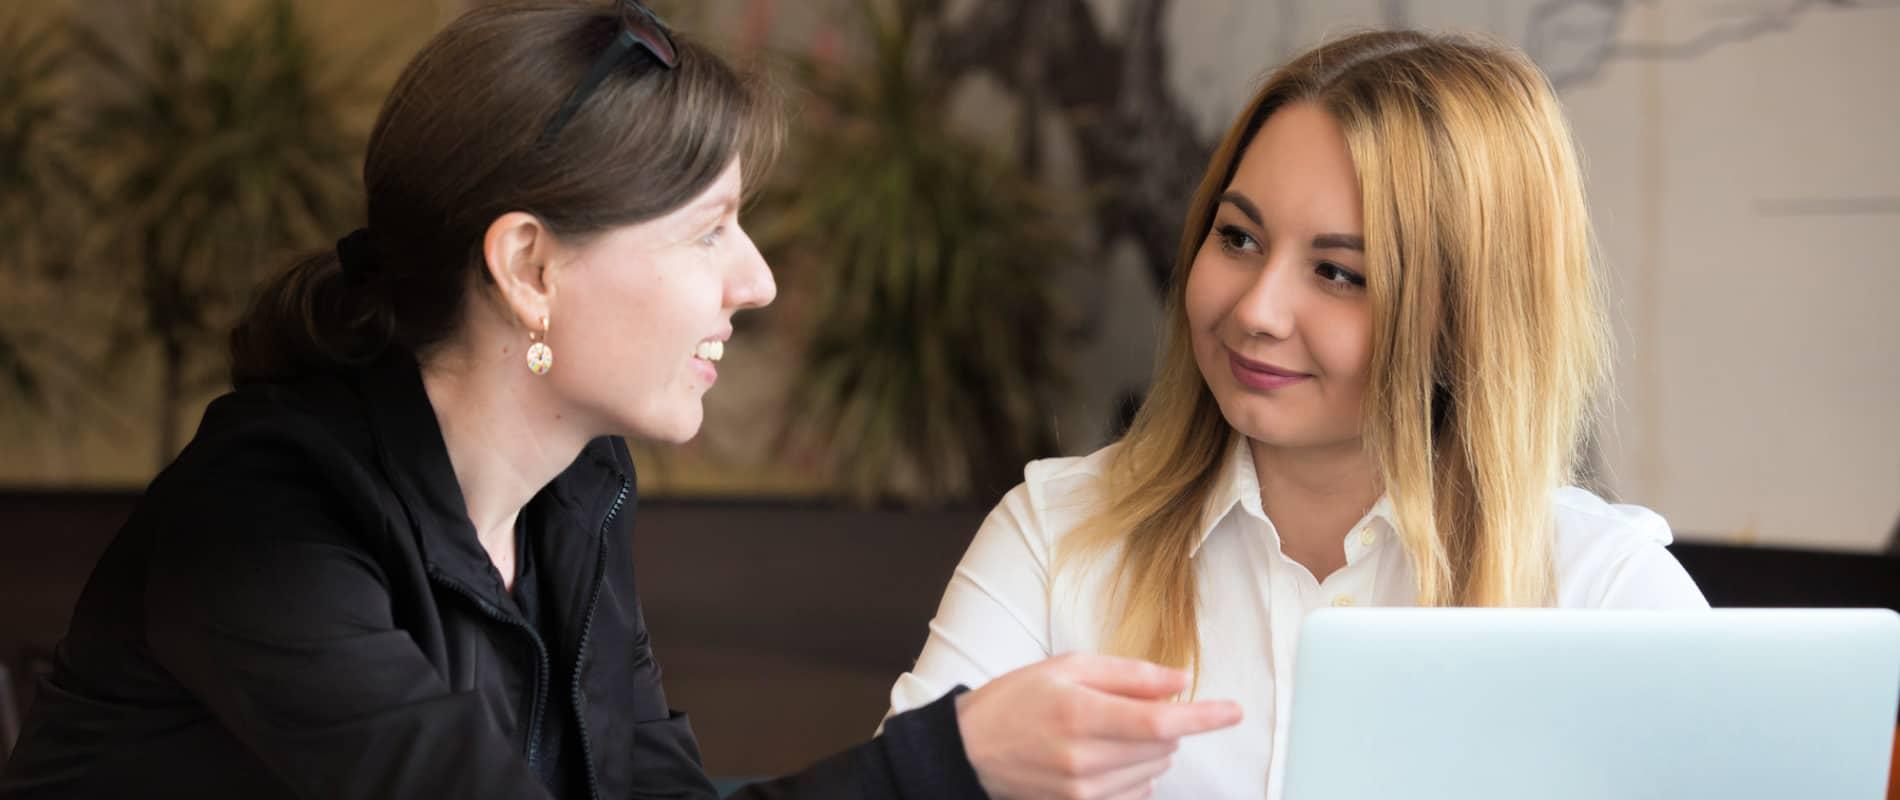 Women in a 1-2-1 meeting